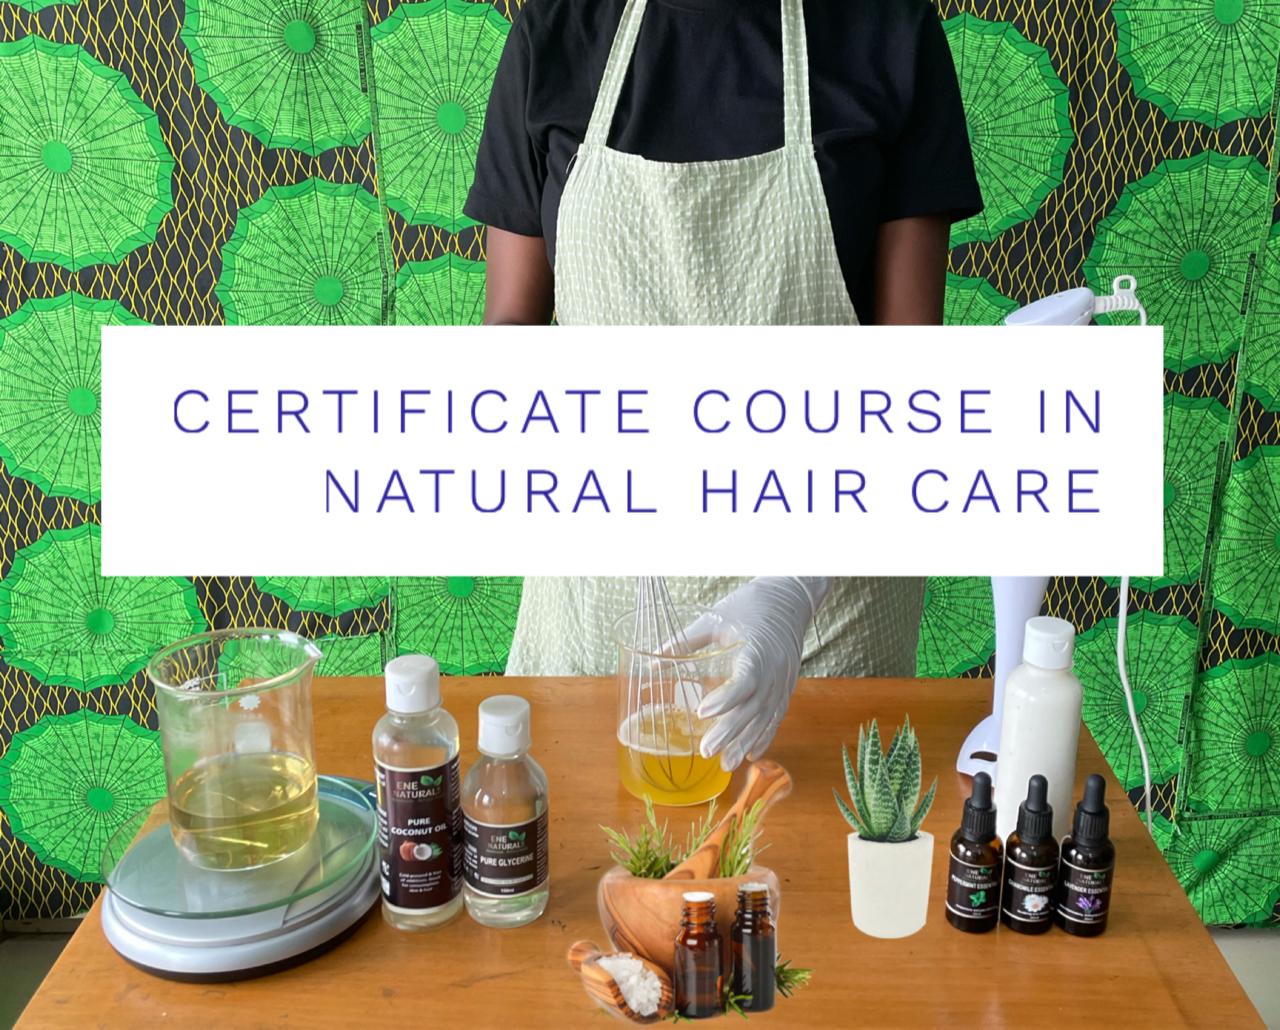 NATURAL HAIR CARE TRAINING